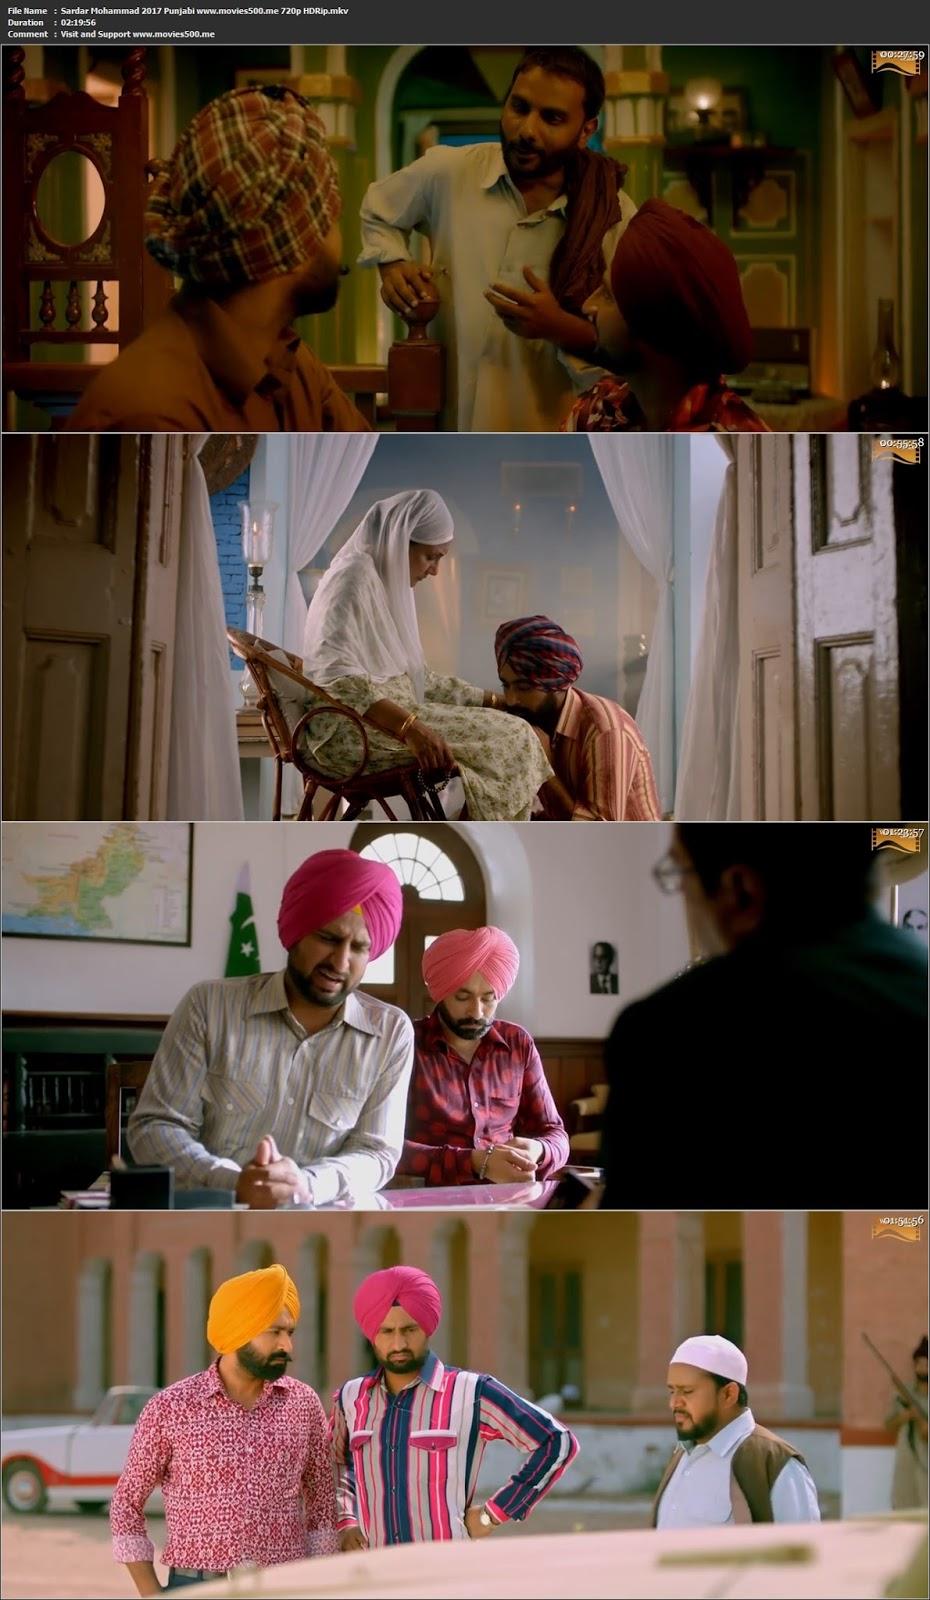 Sardar Mohammad 2017 Punjabi Full Movie HDRip 720p at massage.company